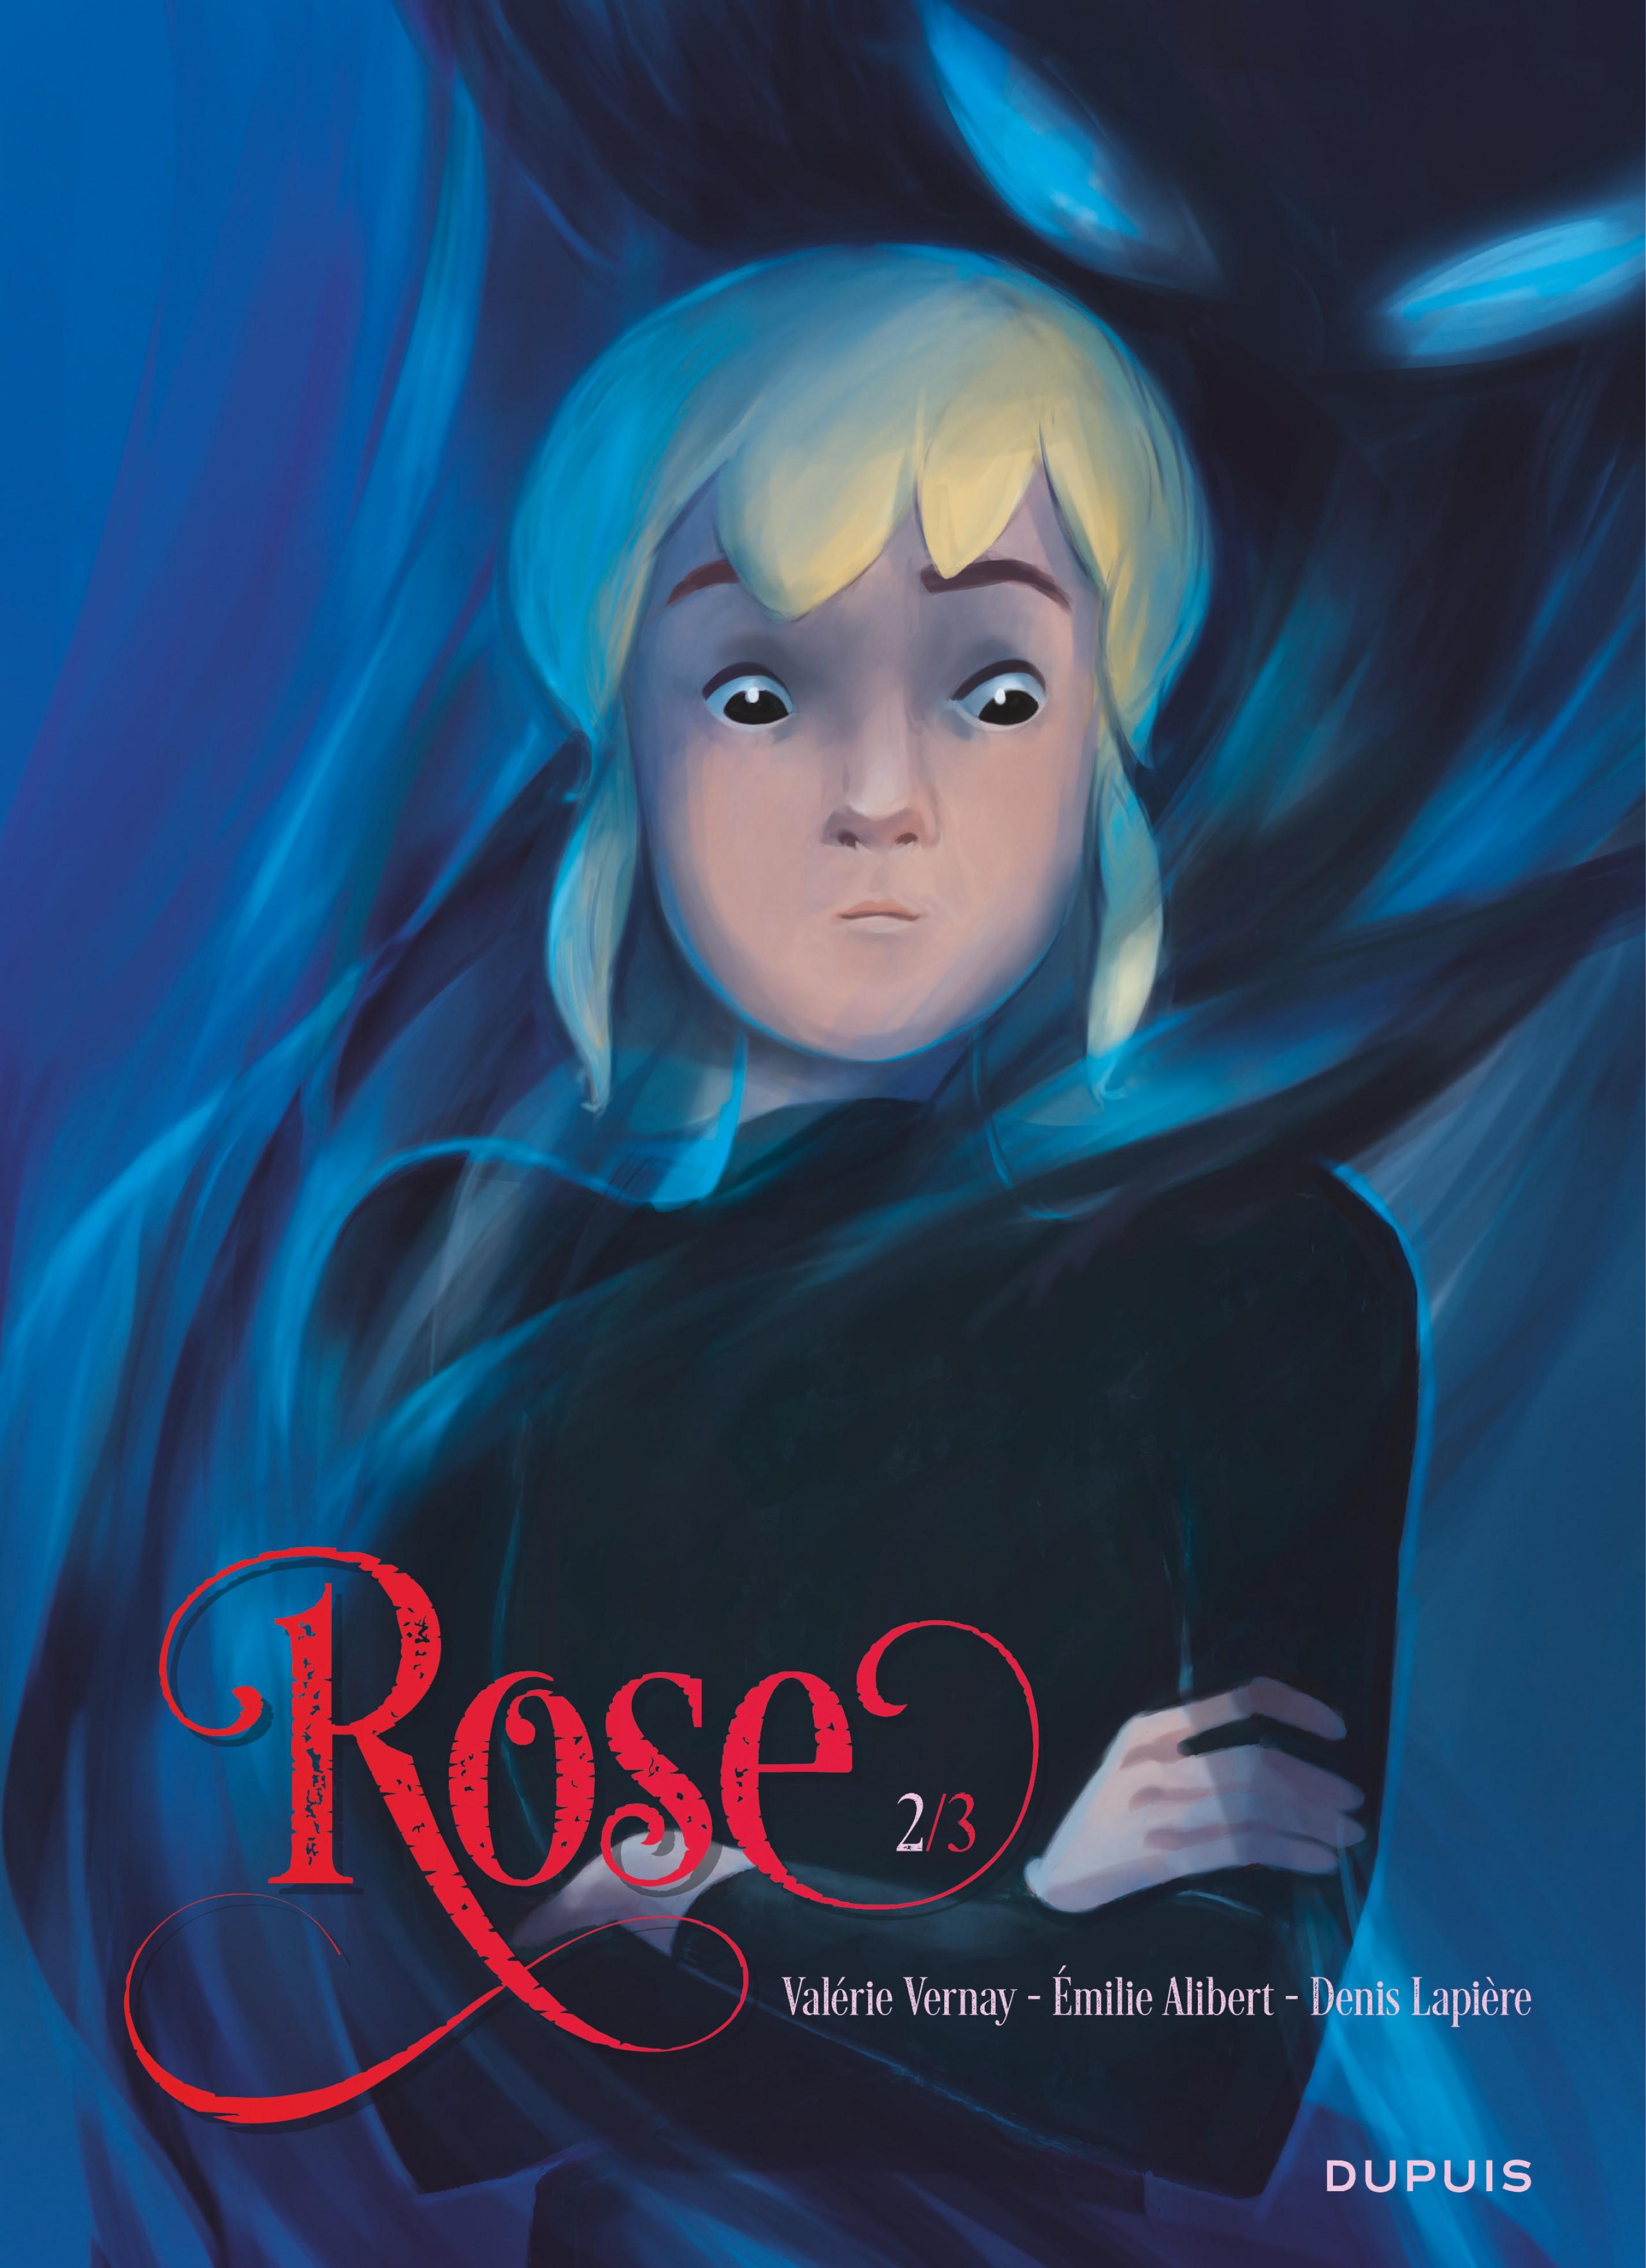 Rose - Tome 2 - Rose 2/3 | Émilie Alibert,